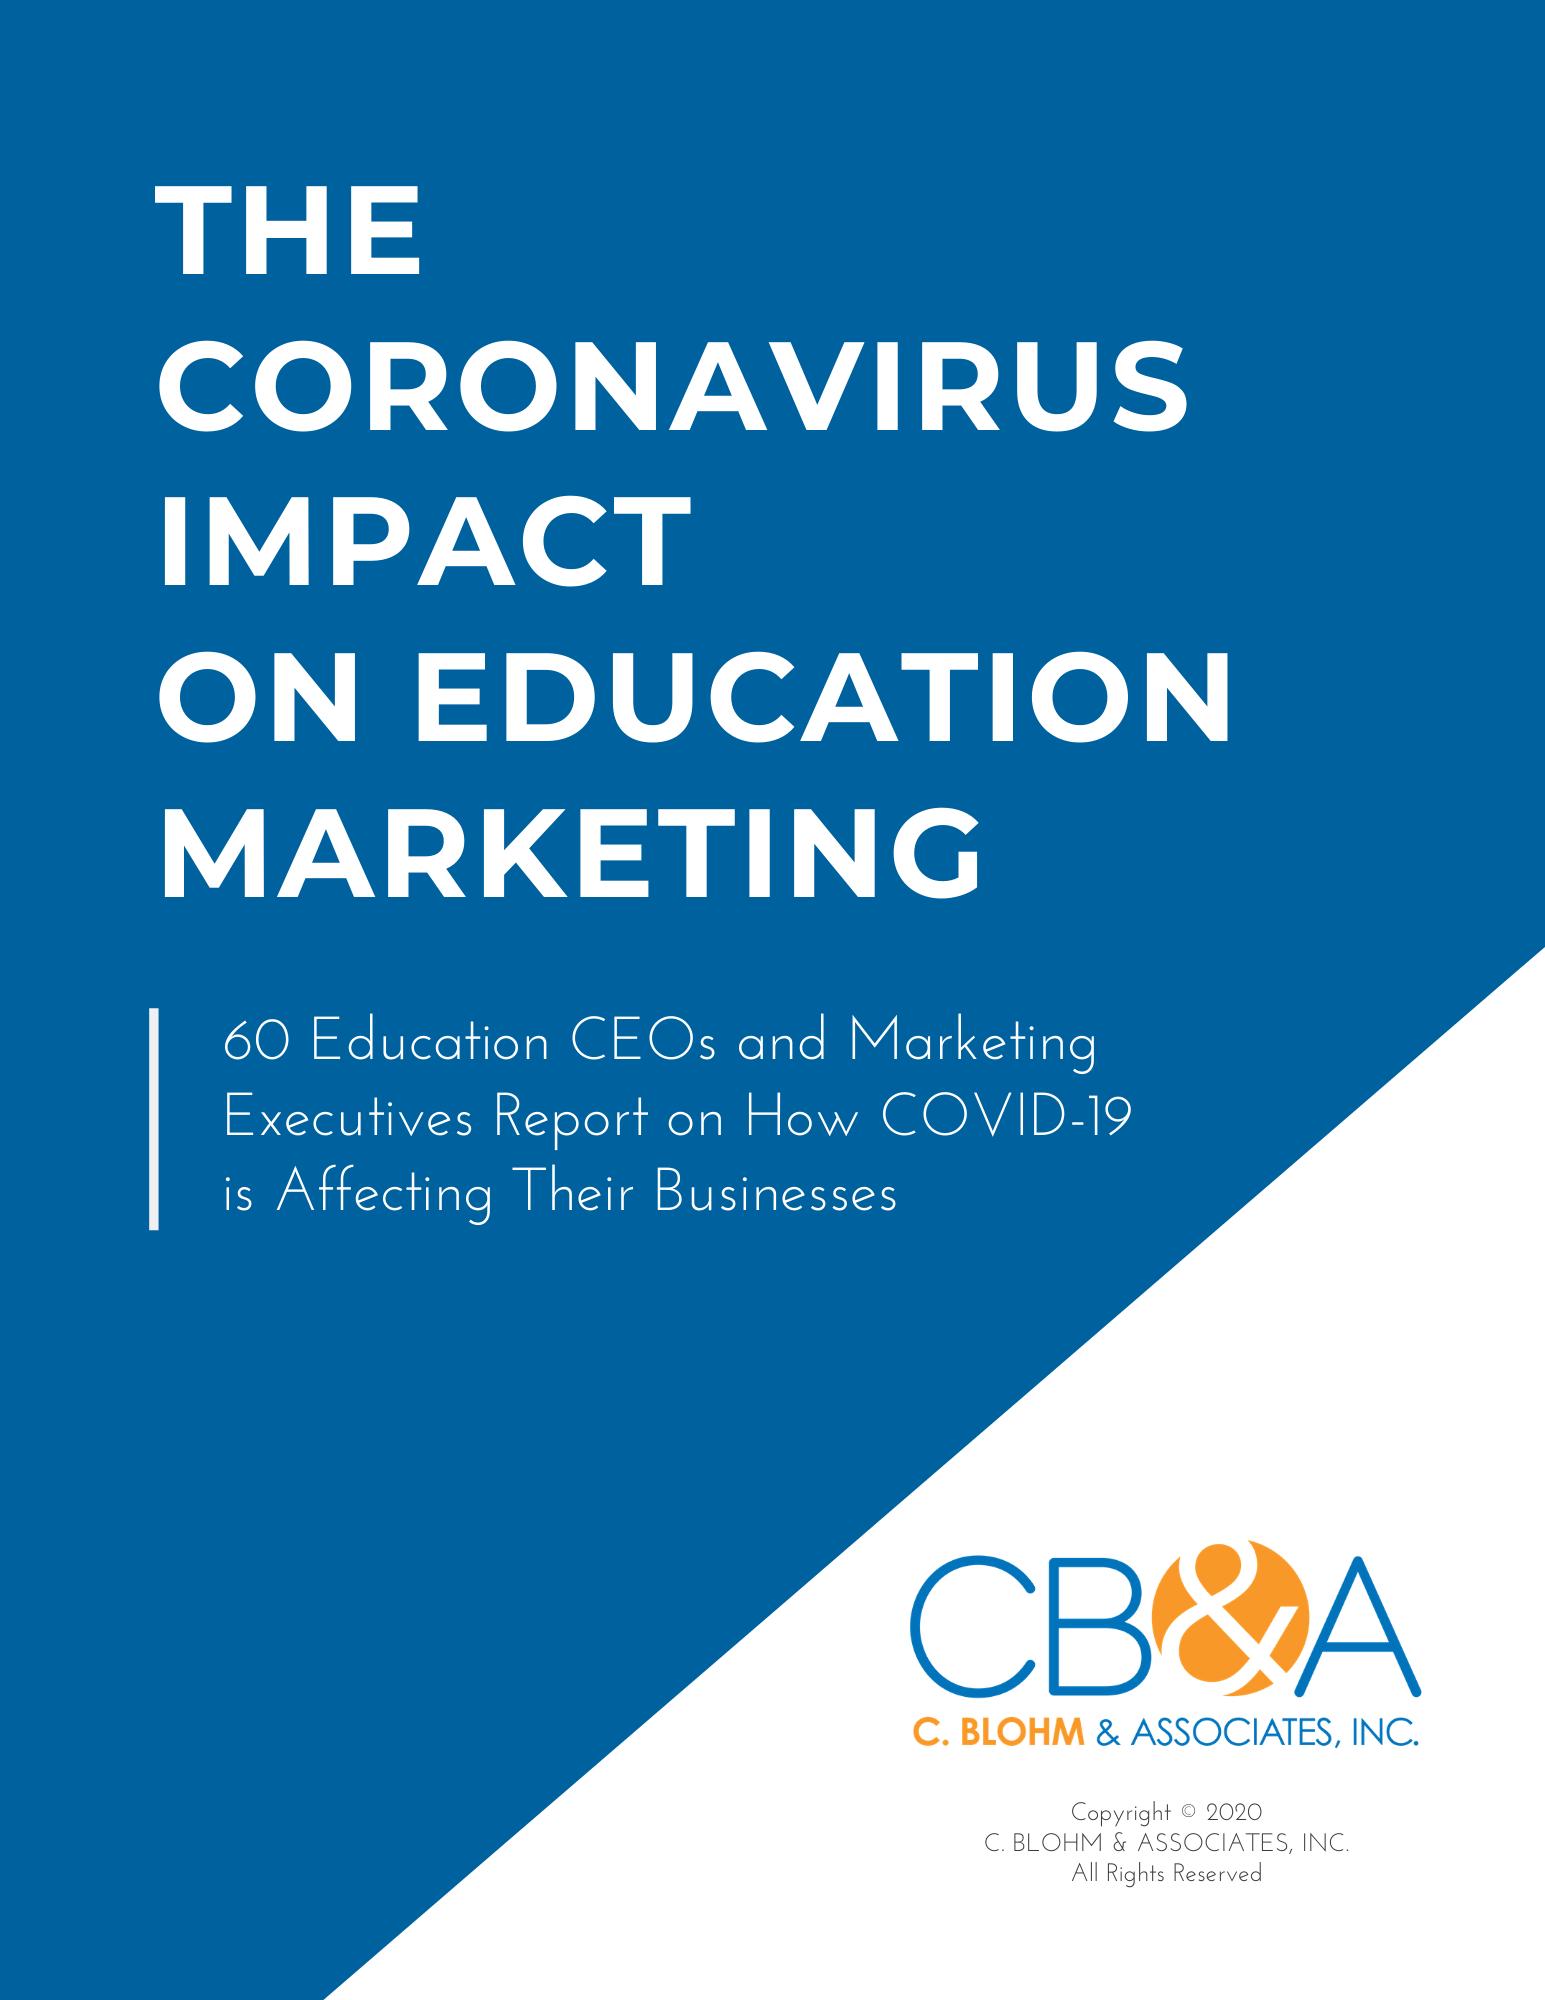 CB&A_Coronavirus Impact on Education Marketing_April 2020